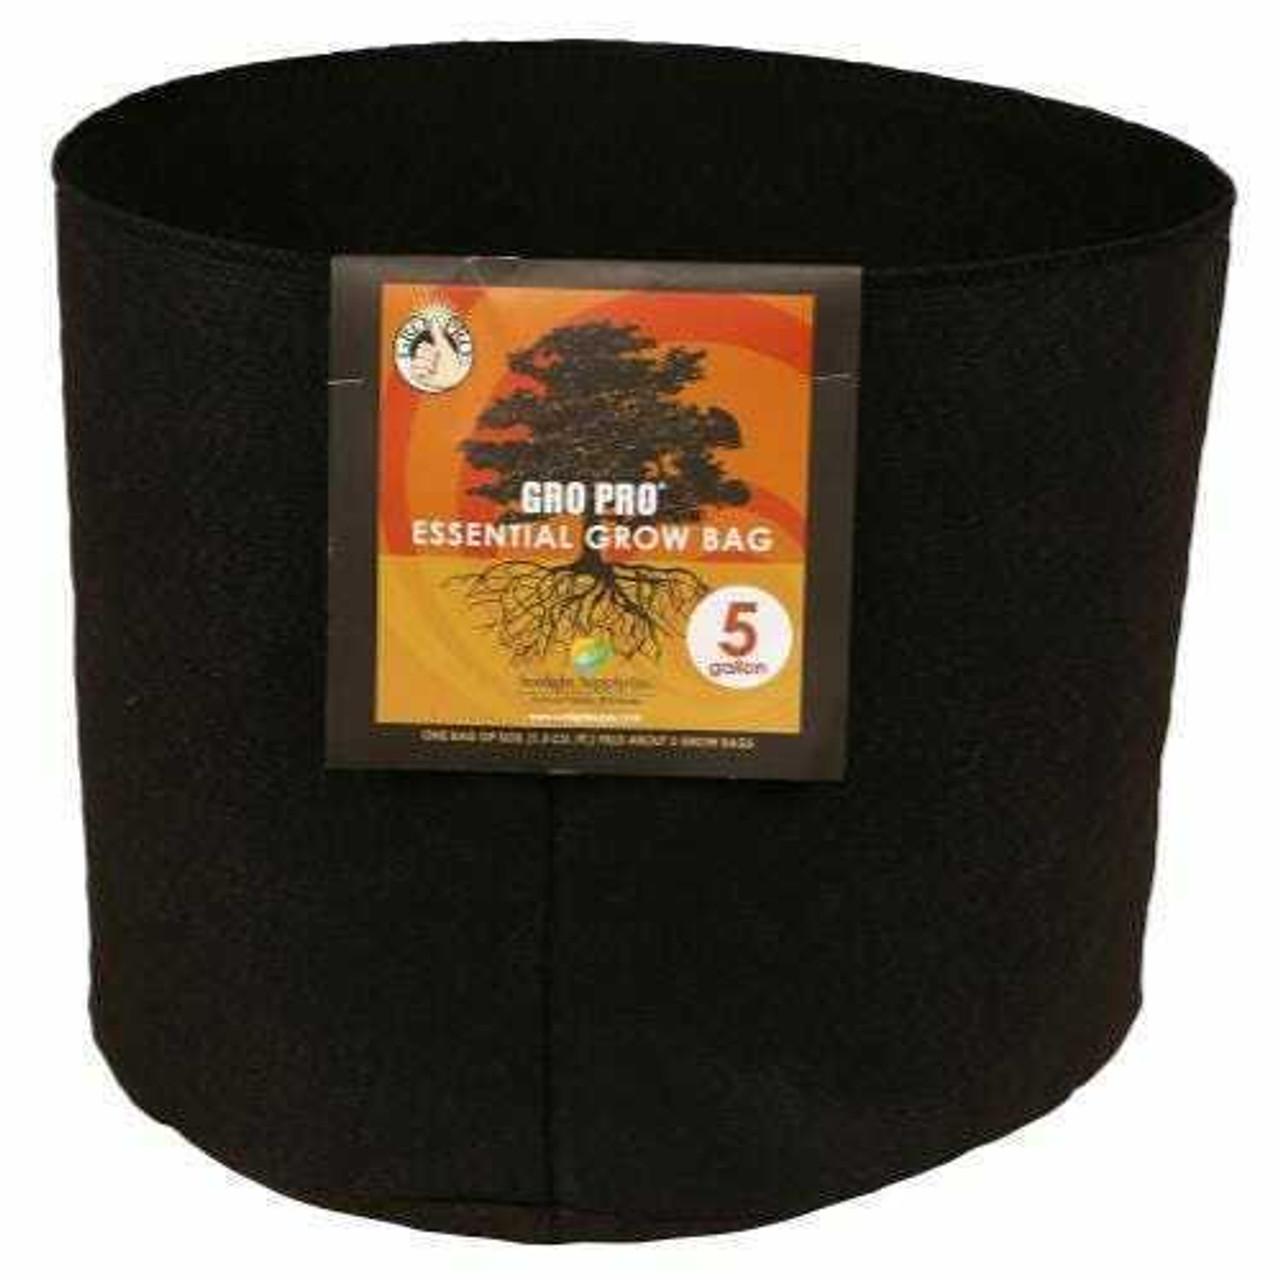 Gro Pro Essential Round Fabric Pot - Black 5 Gallon